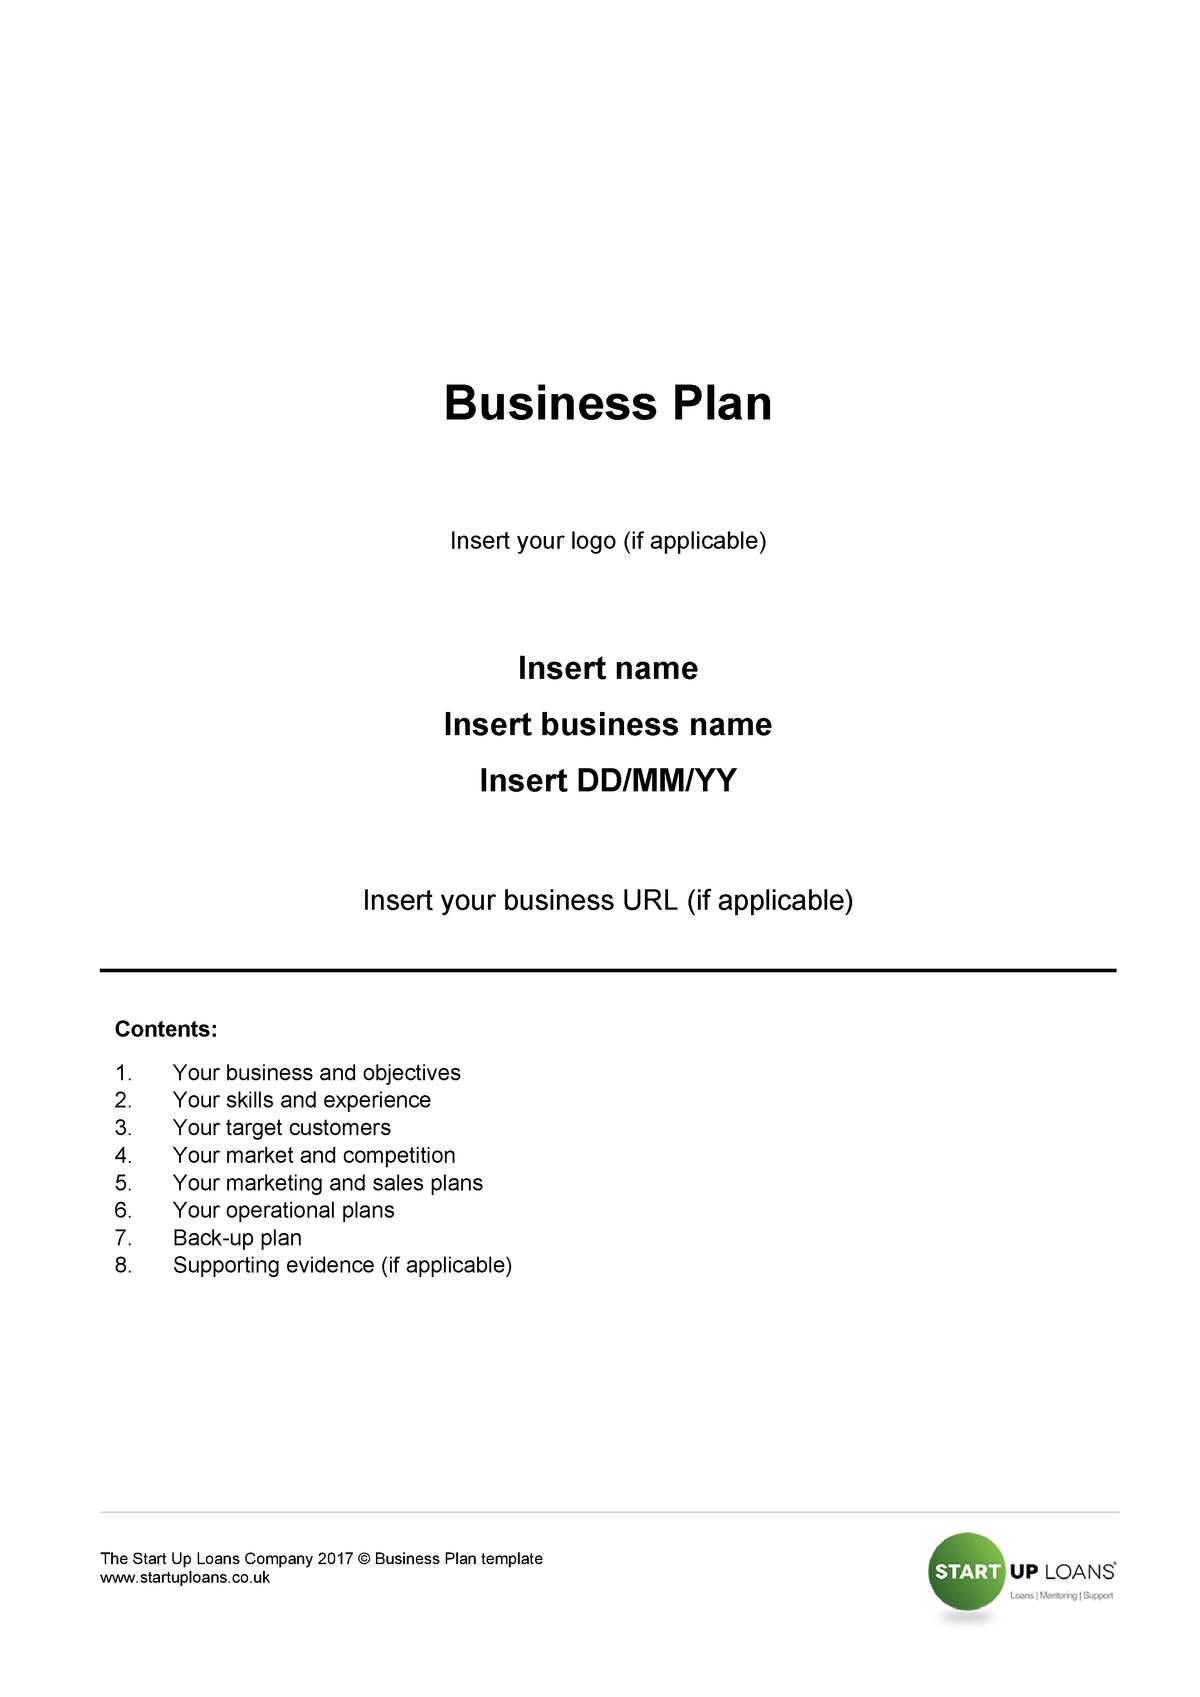 small loan business plan